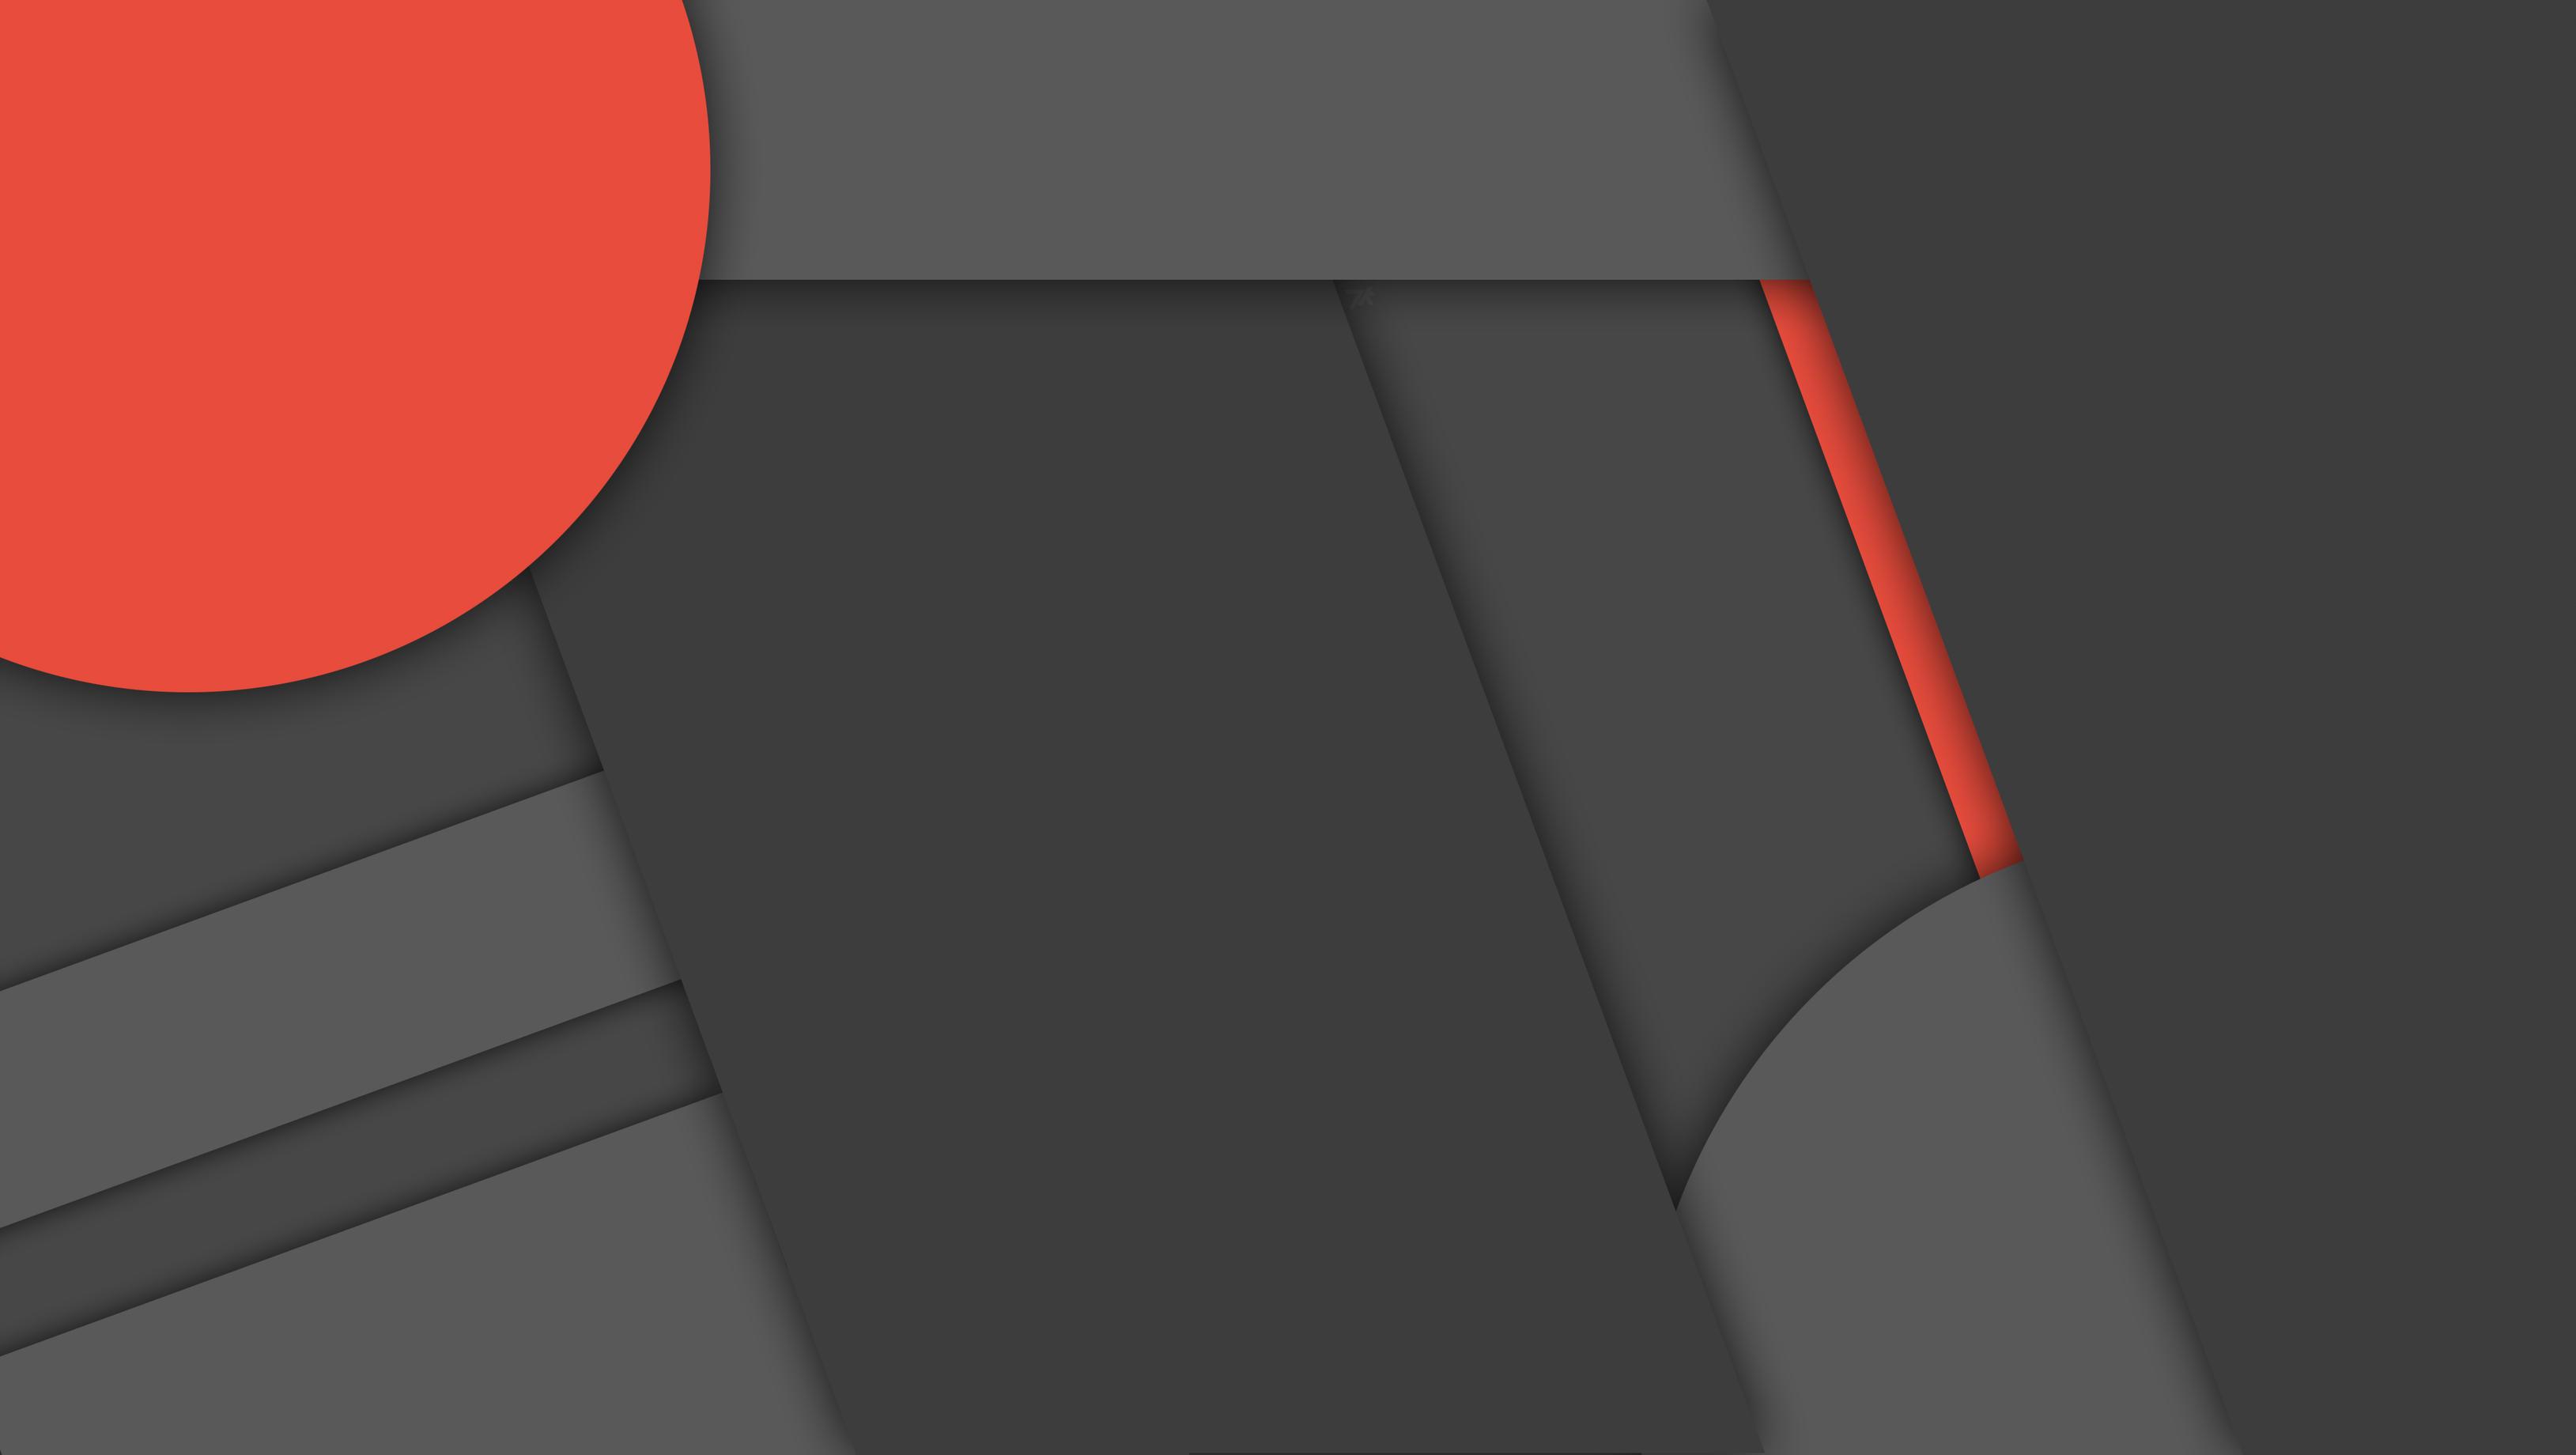 [MinFlat] Dark Material Design Wallpaper 2 (4K) by DaKoder